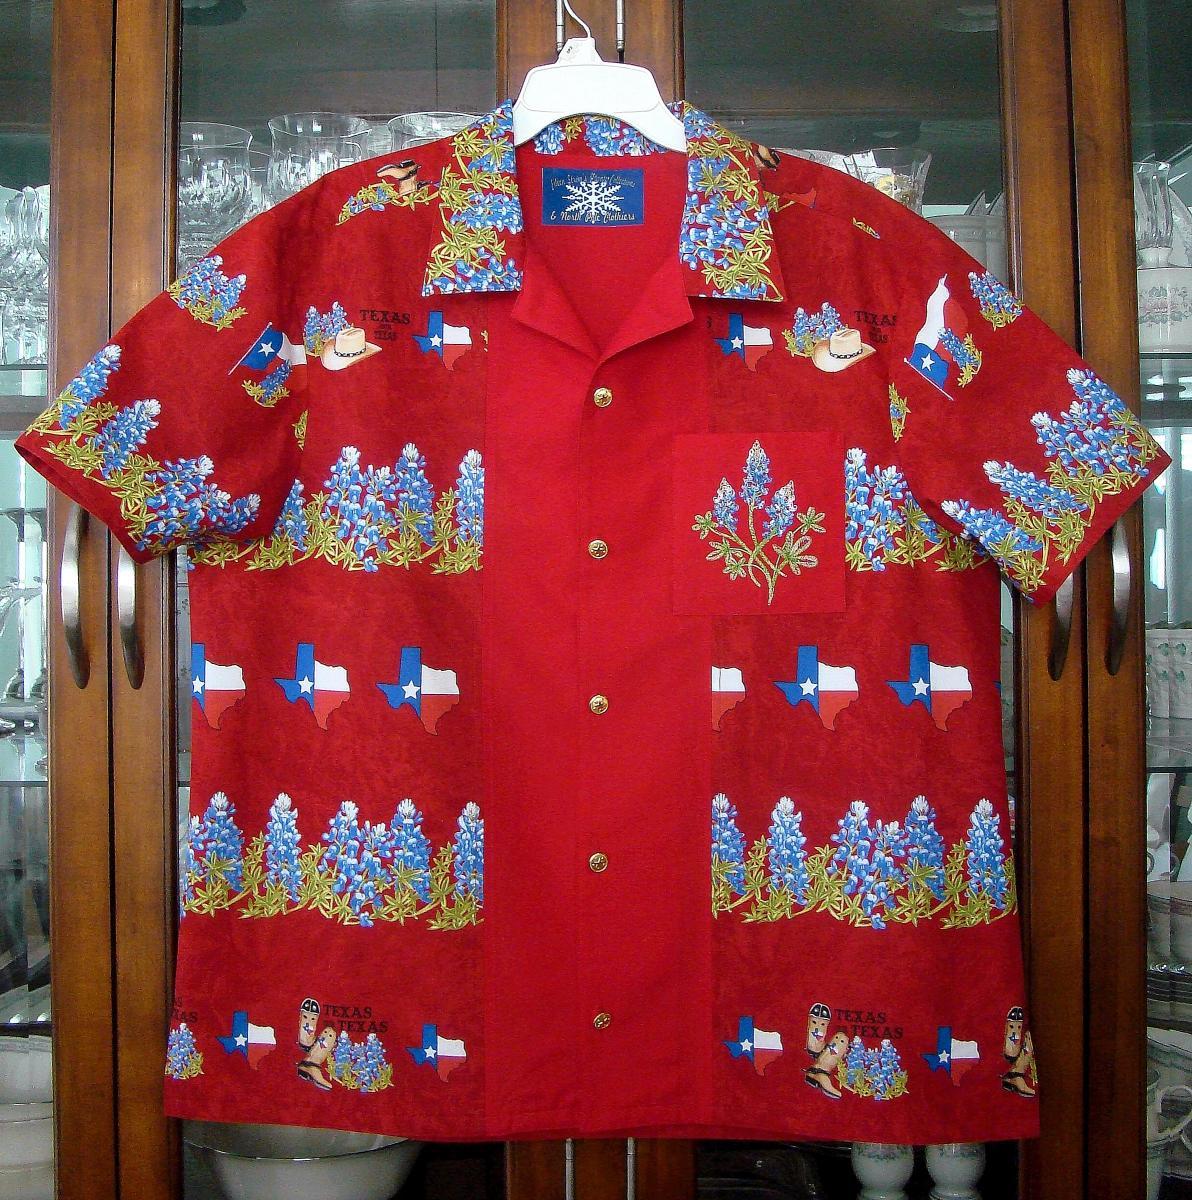 Texas Bowling Shirt style Hawaiian Shirt